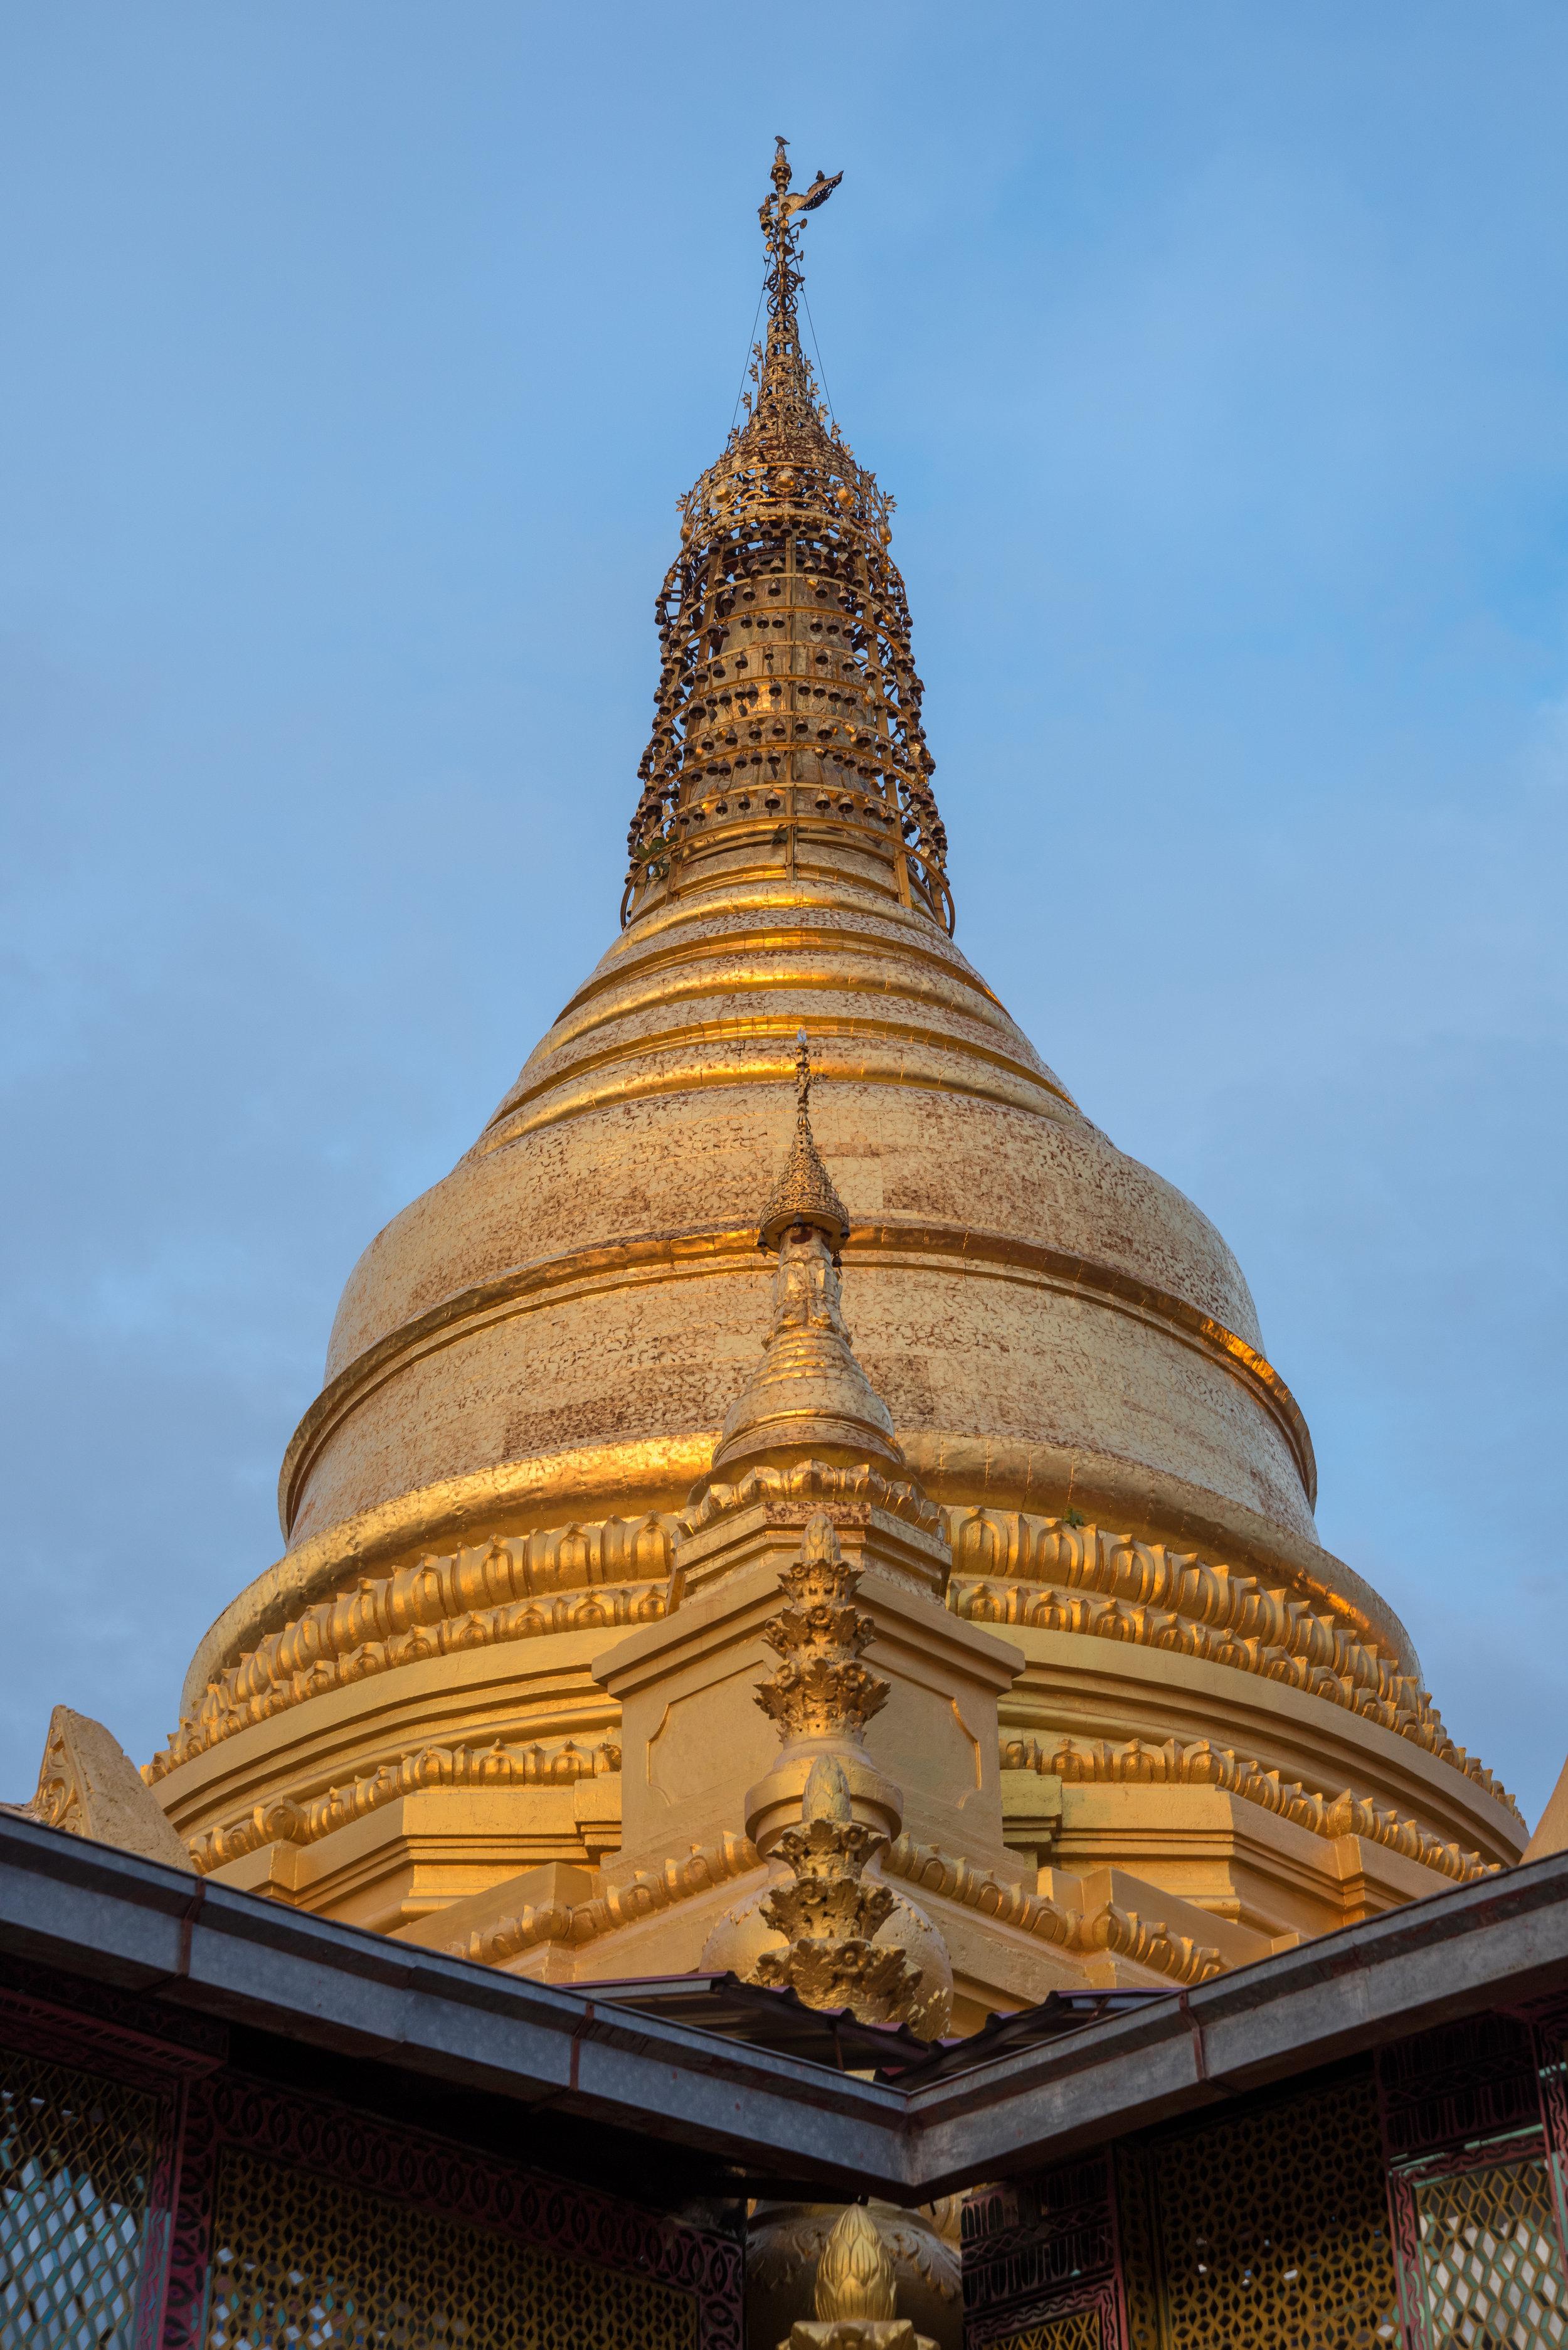 Kuthodaw Pagoda, Mandalay Hill, Mandalay, Myanmar